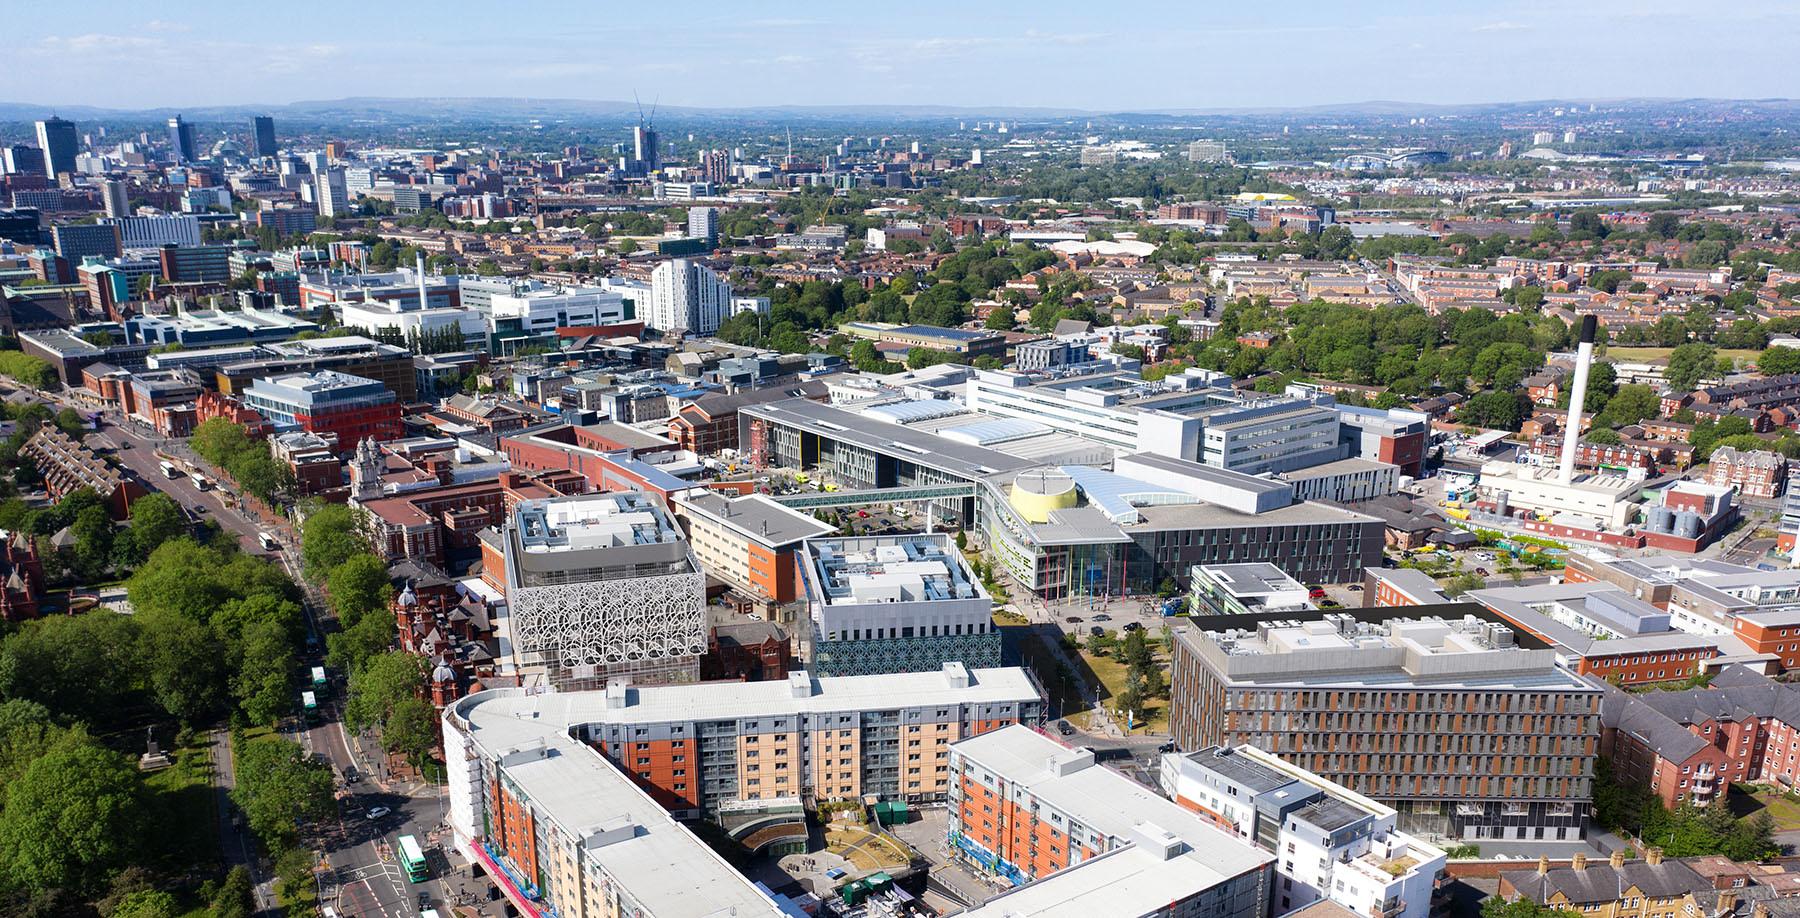 A CGI of the CityLabs masterplan